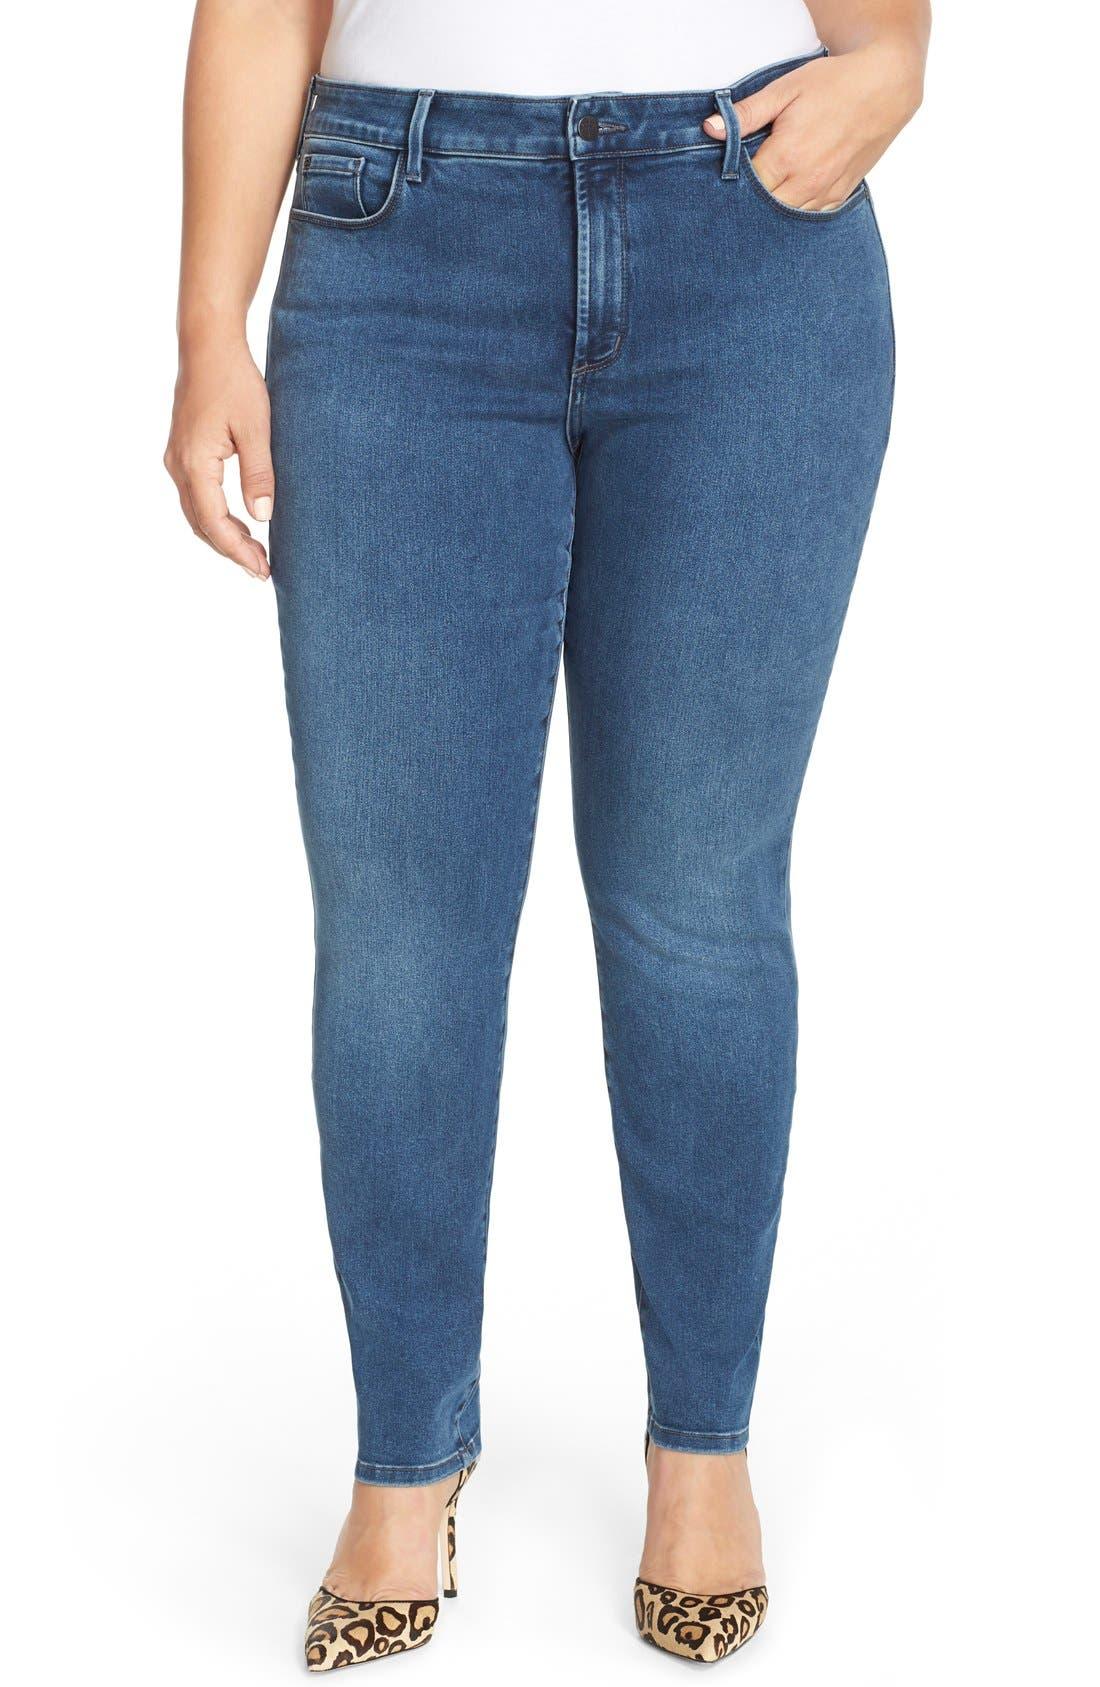 'Alina' Stretch Skinny Jeans,                             Main thumbnail 1, color,                             461